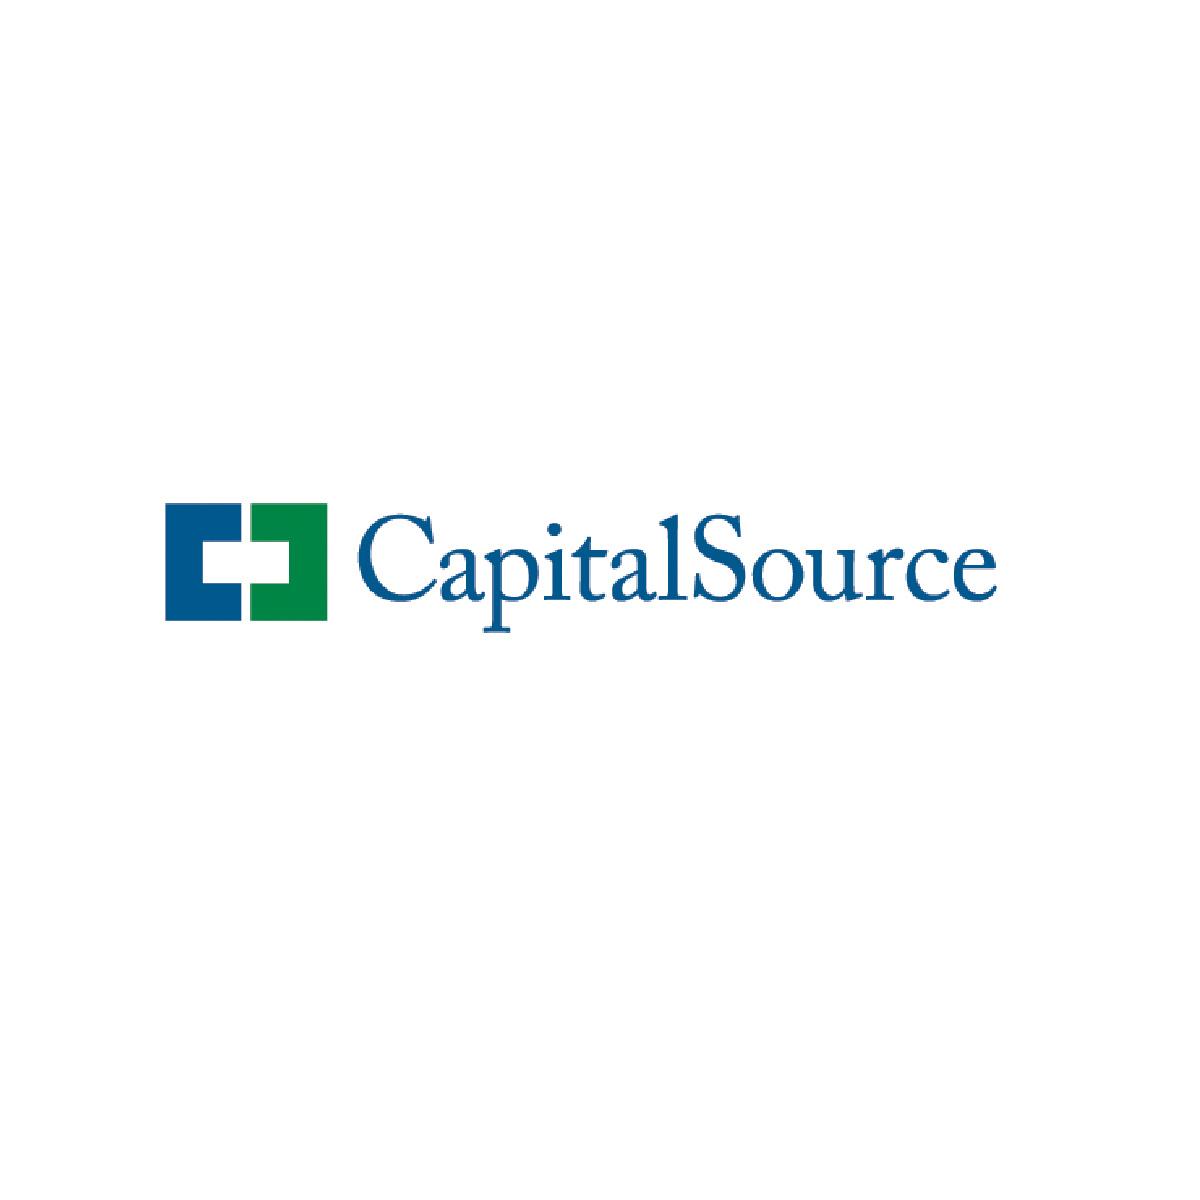 Capital Source